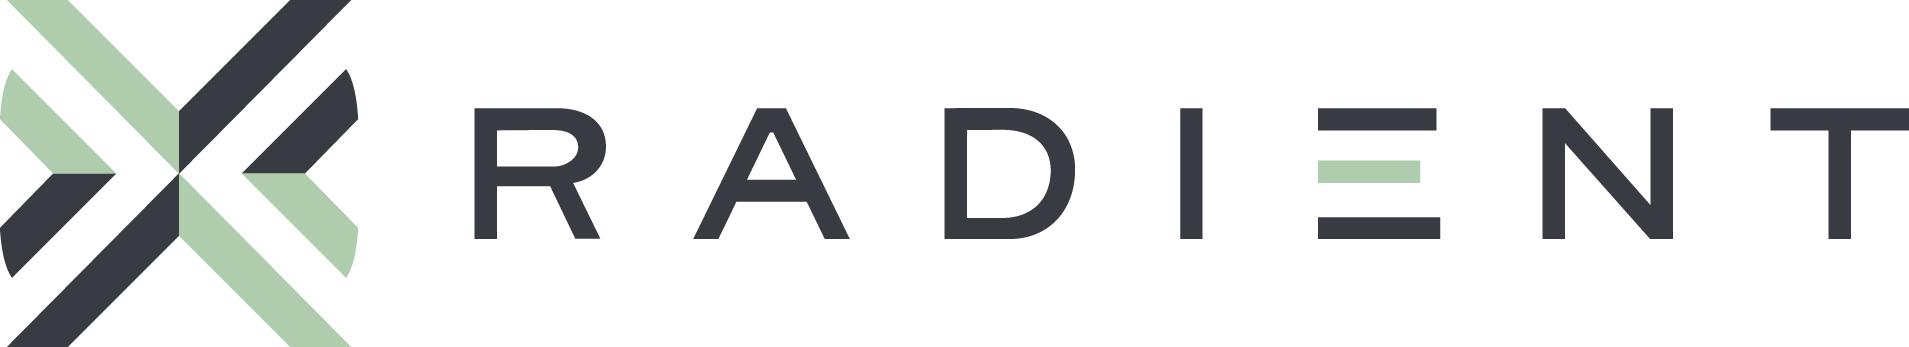 Radient Technologies Announces partnership with US based Dreamy CBD